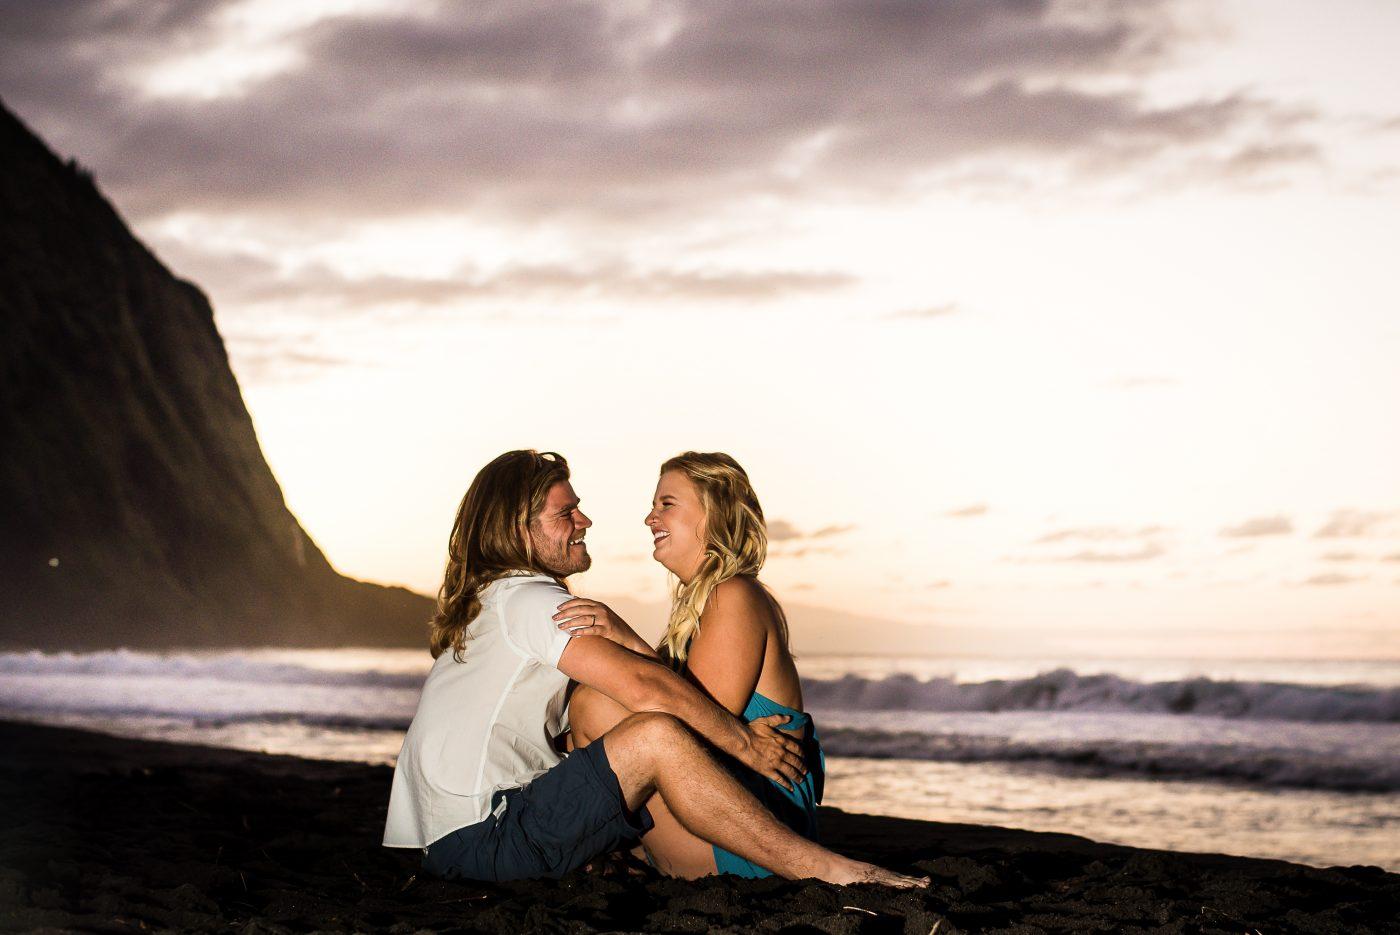 waipio valley, big island, hawaii, engagement, sunset, portrait